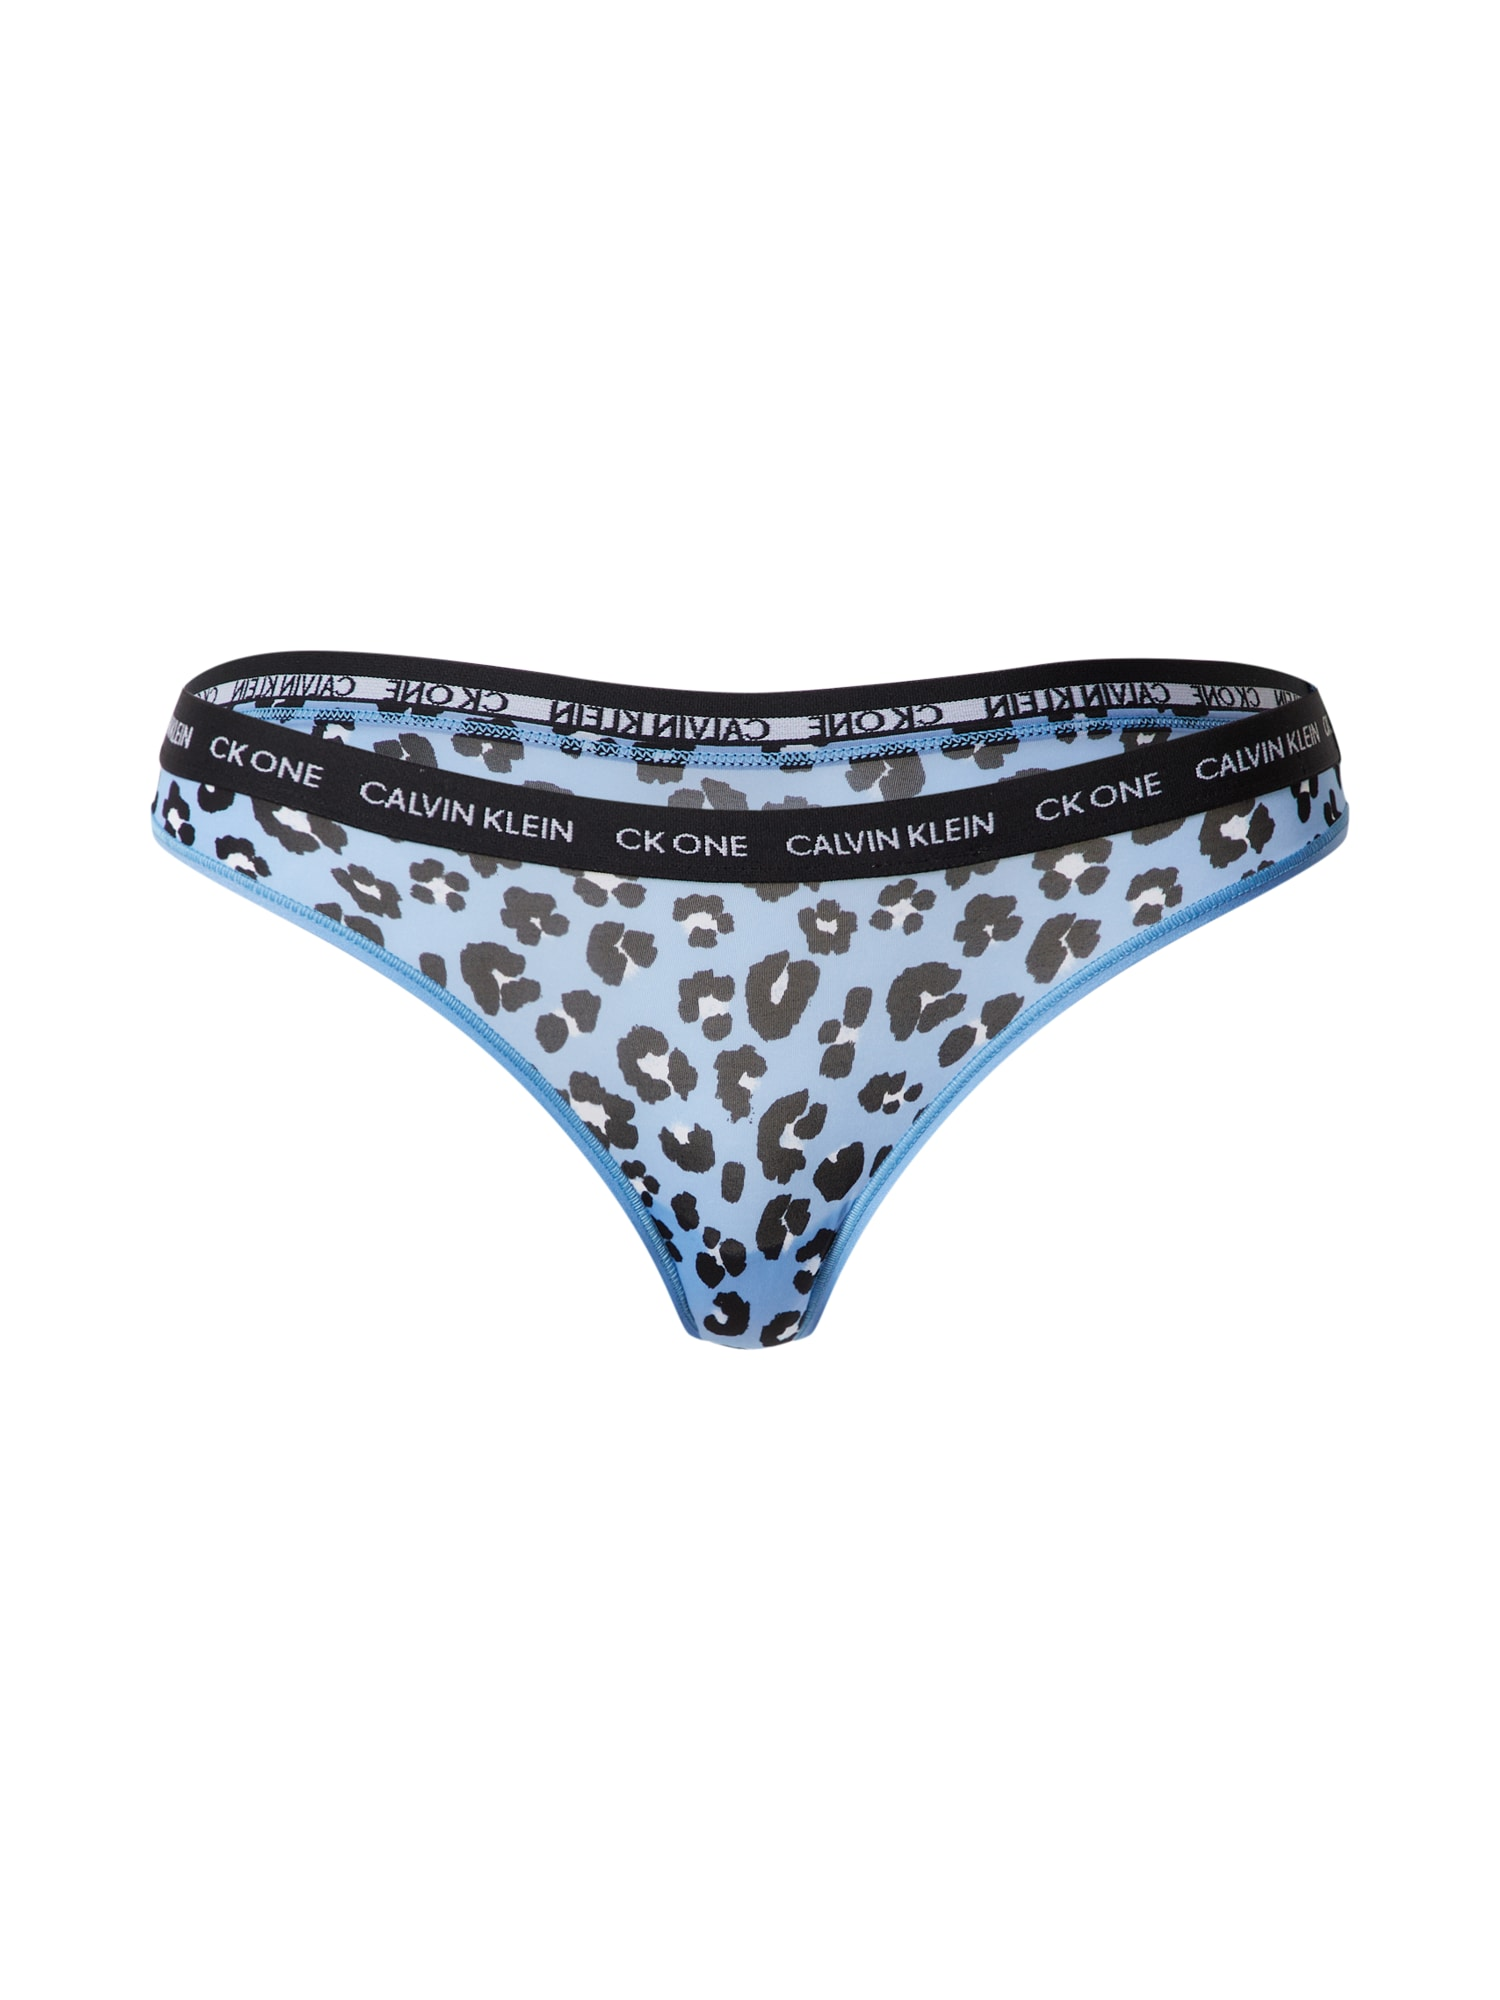 Calvin Klein Underwear Siaurikės 'THONG' juoda / mėlyna